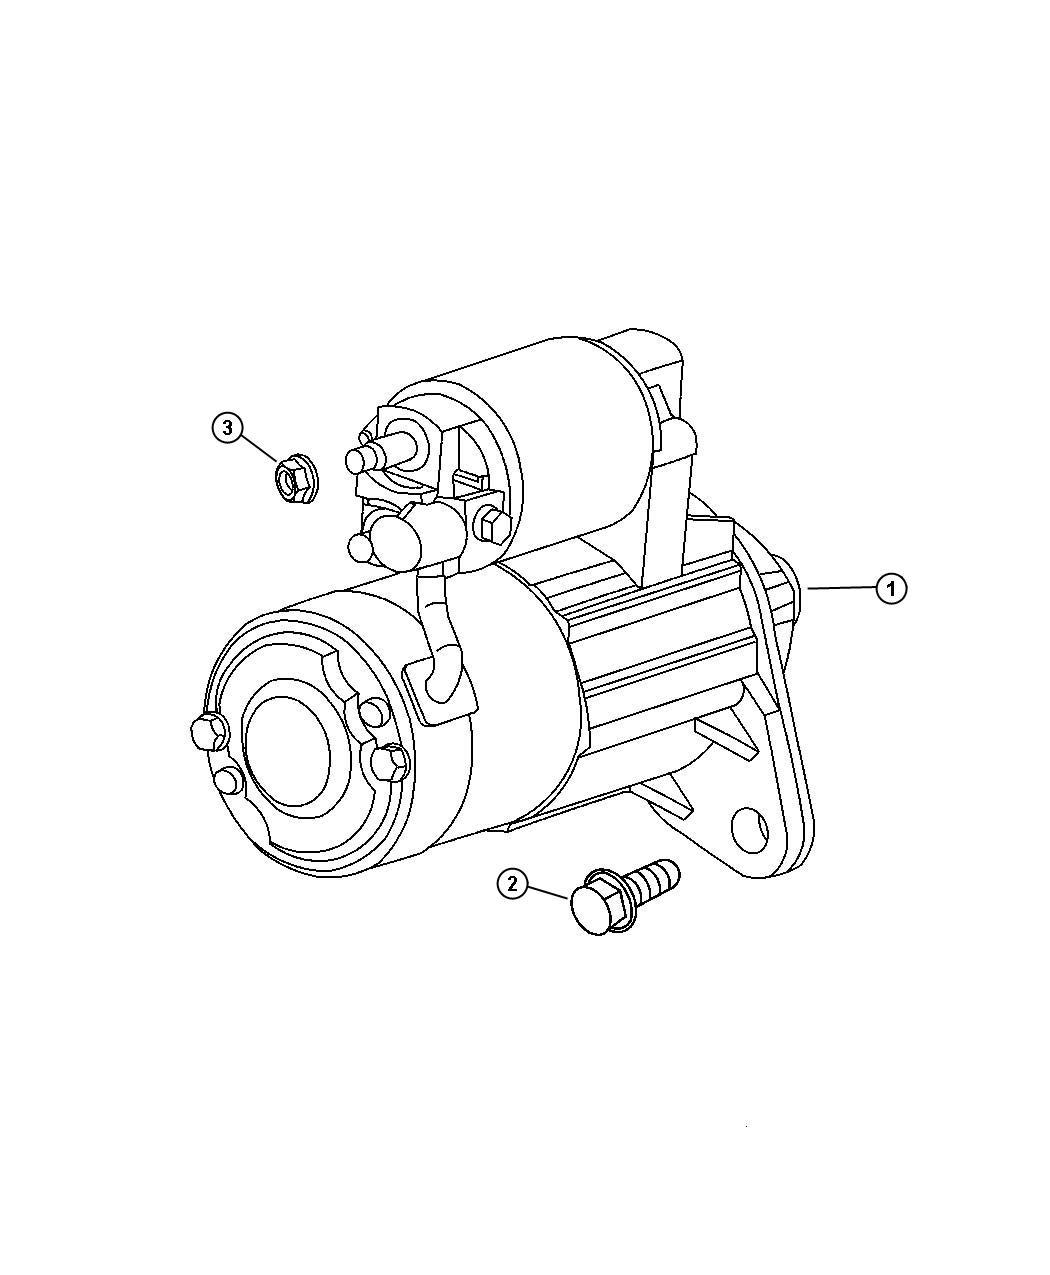 Chrysler Pt Cruiser Starter Engine Remanufactured